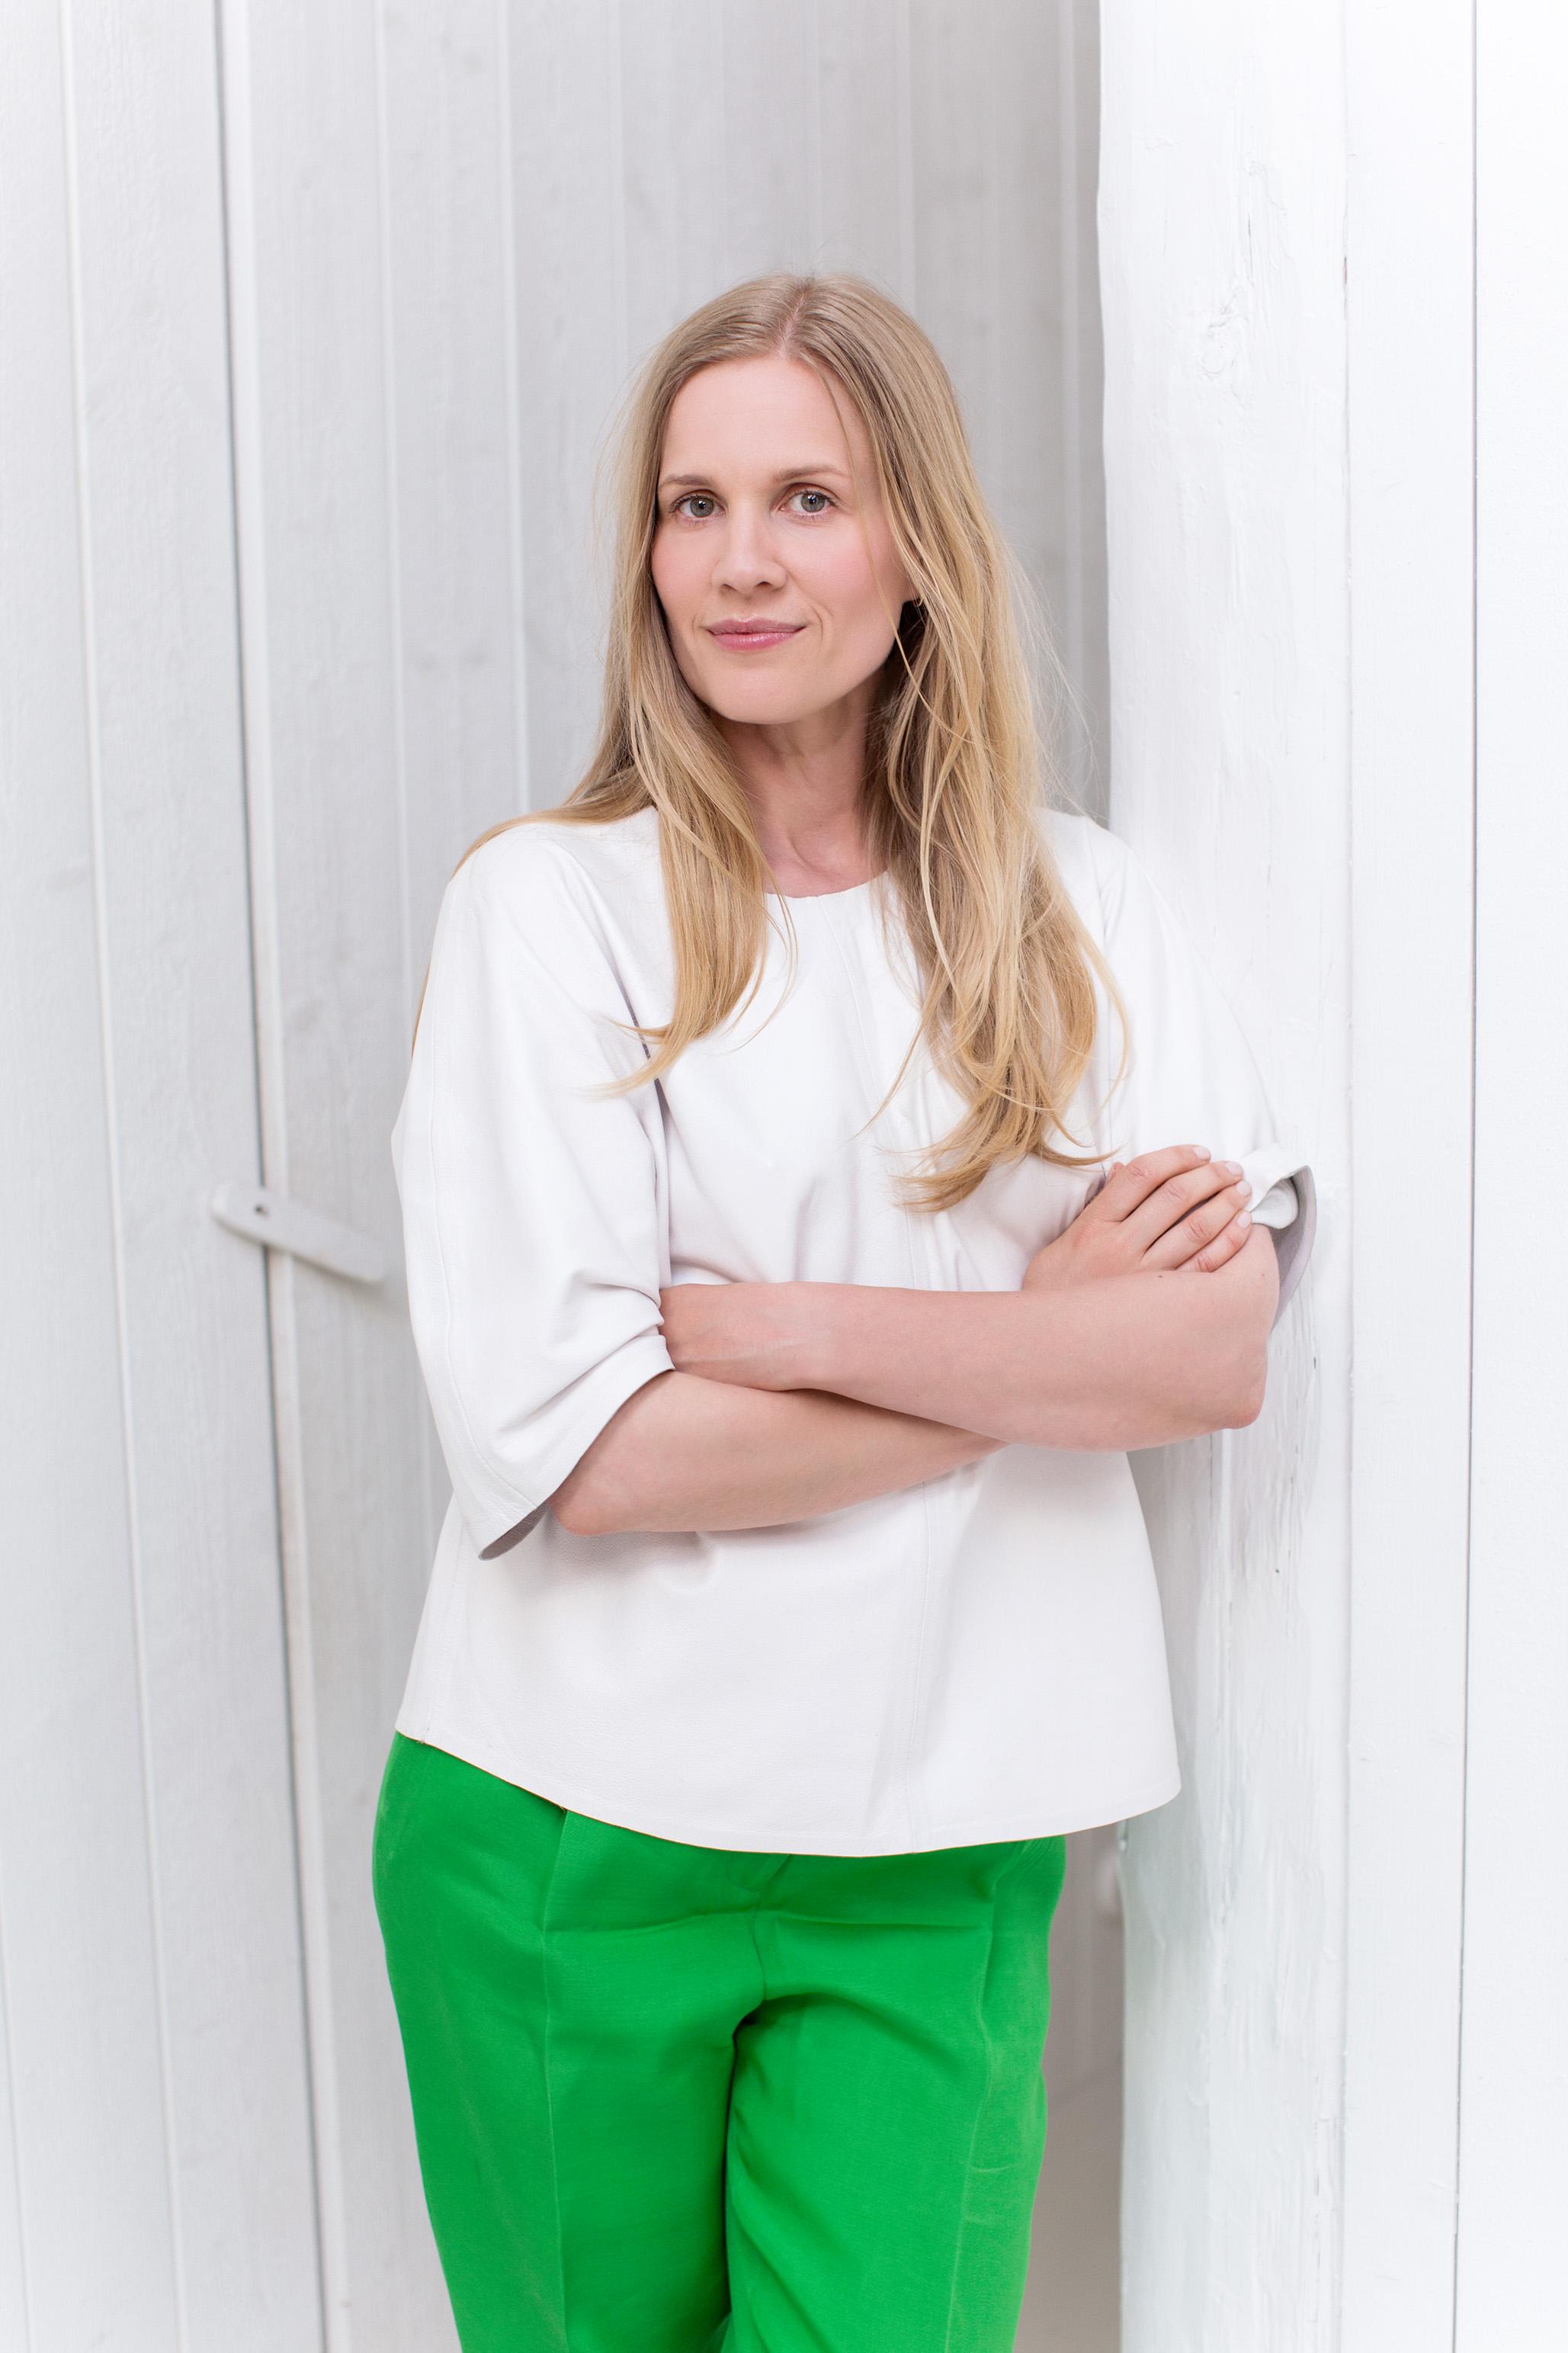 Linda Bergroth. Image: Paavo Lehtonen.